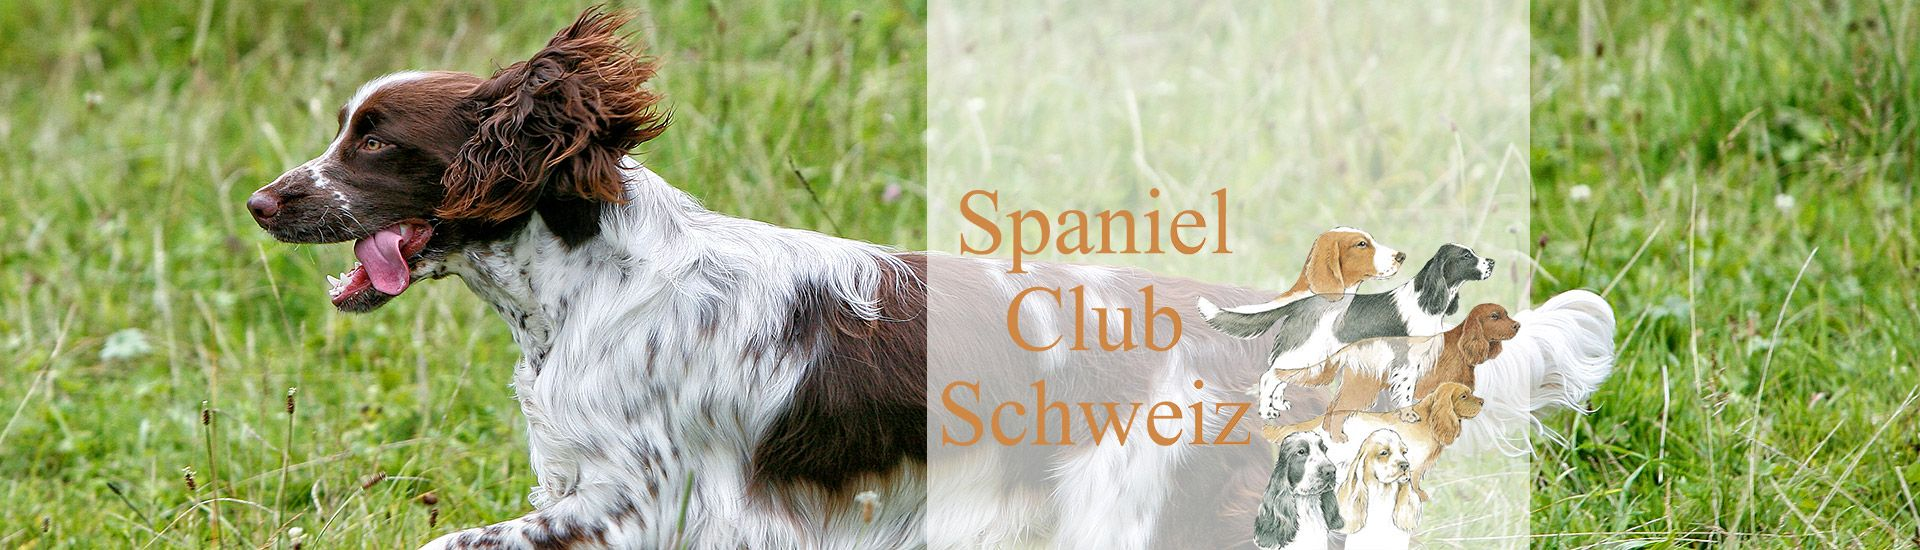 Spaniel Club Der Schweiz Jagd